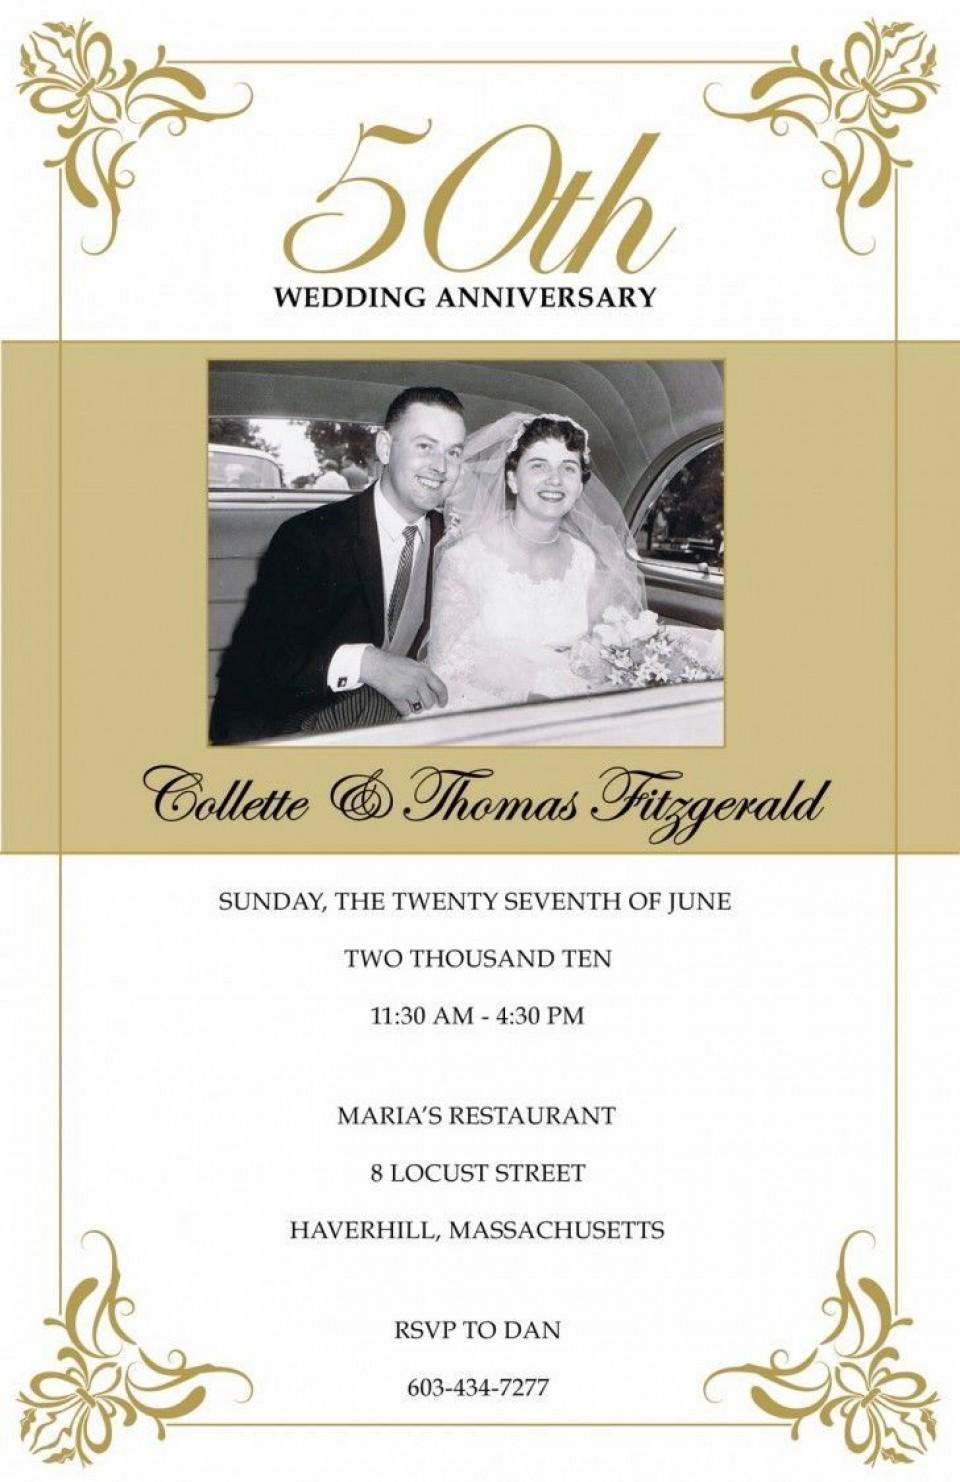 009 Breathtaking 50th Anniversary Invitation Template High Resolution  Wedding Microsoft Word Free Download960